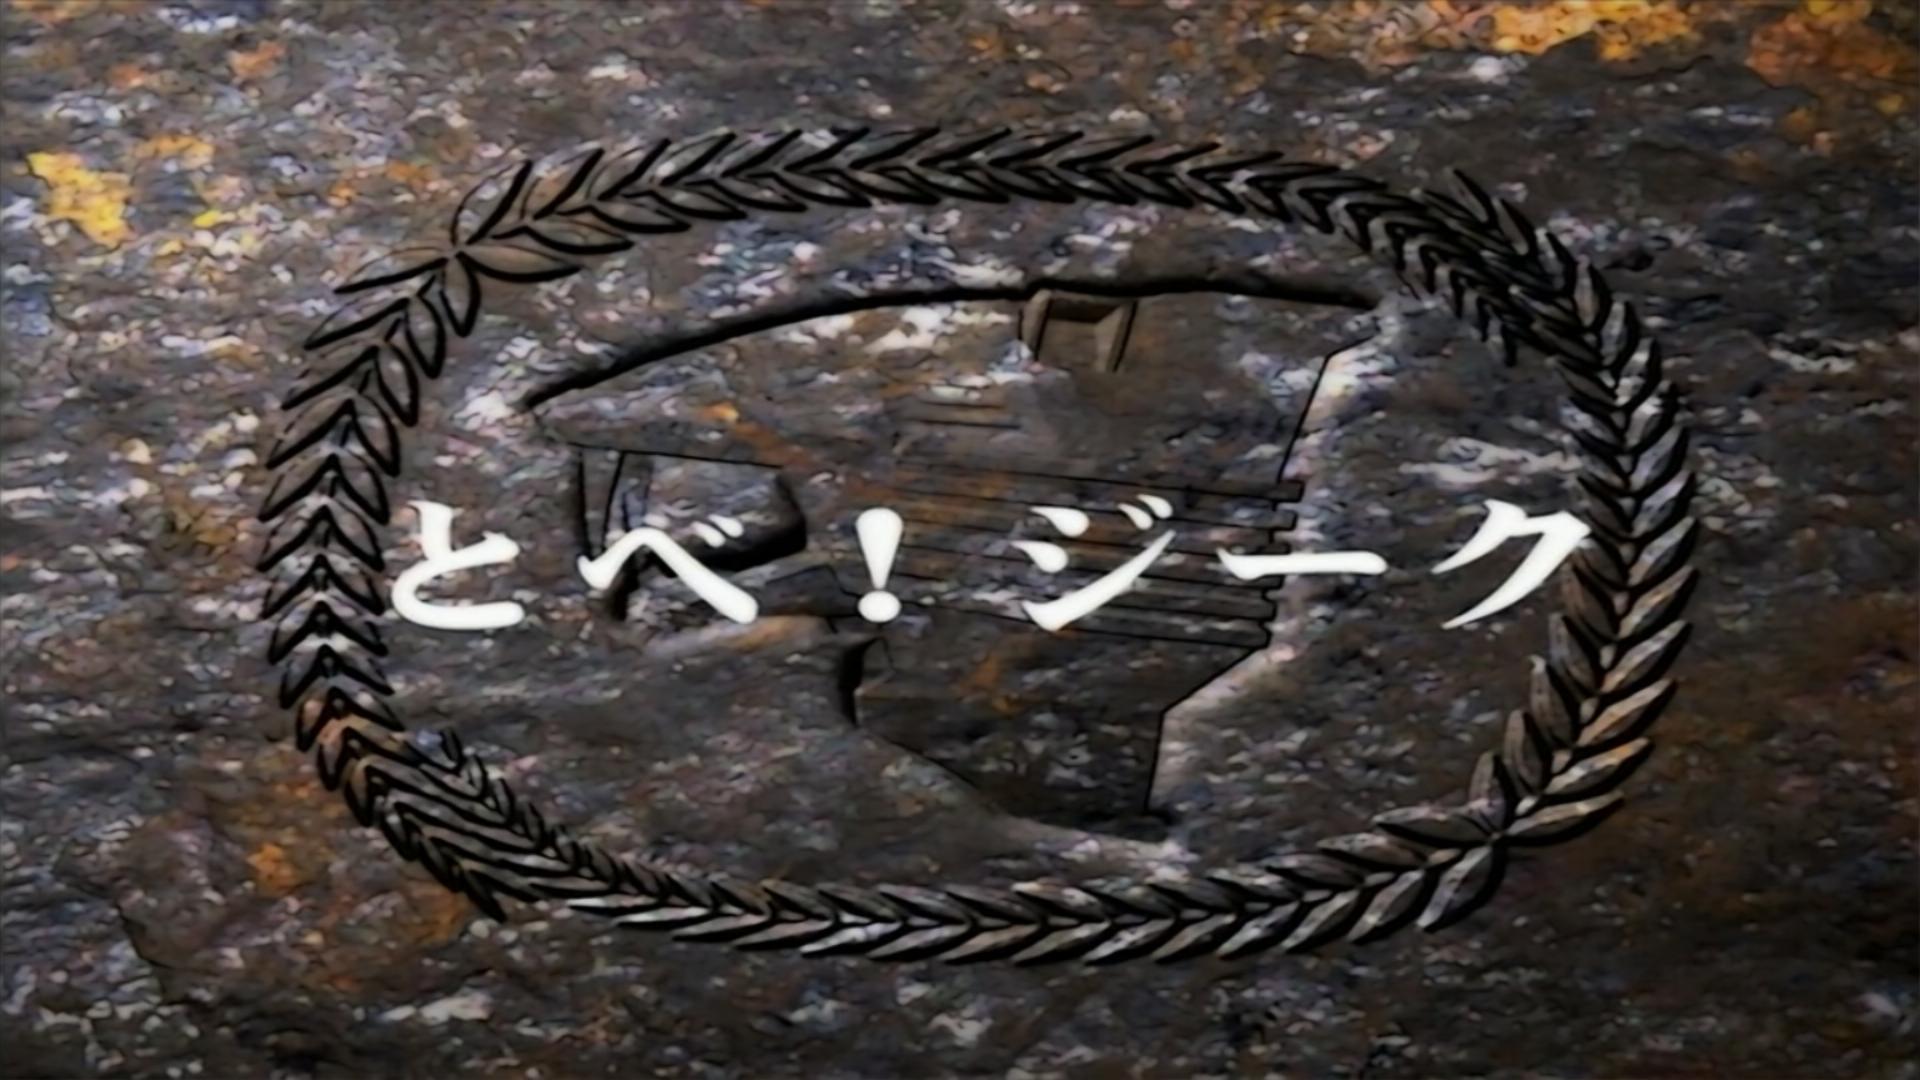 Zoids: Chaotic Century Episode 6